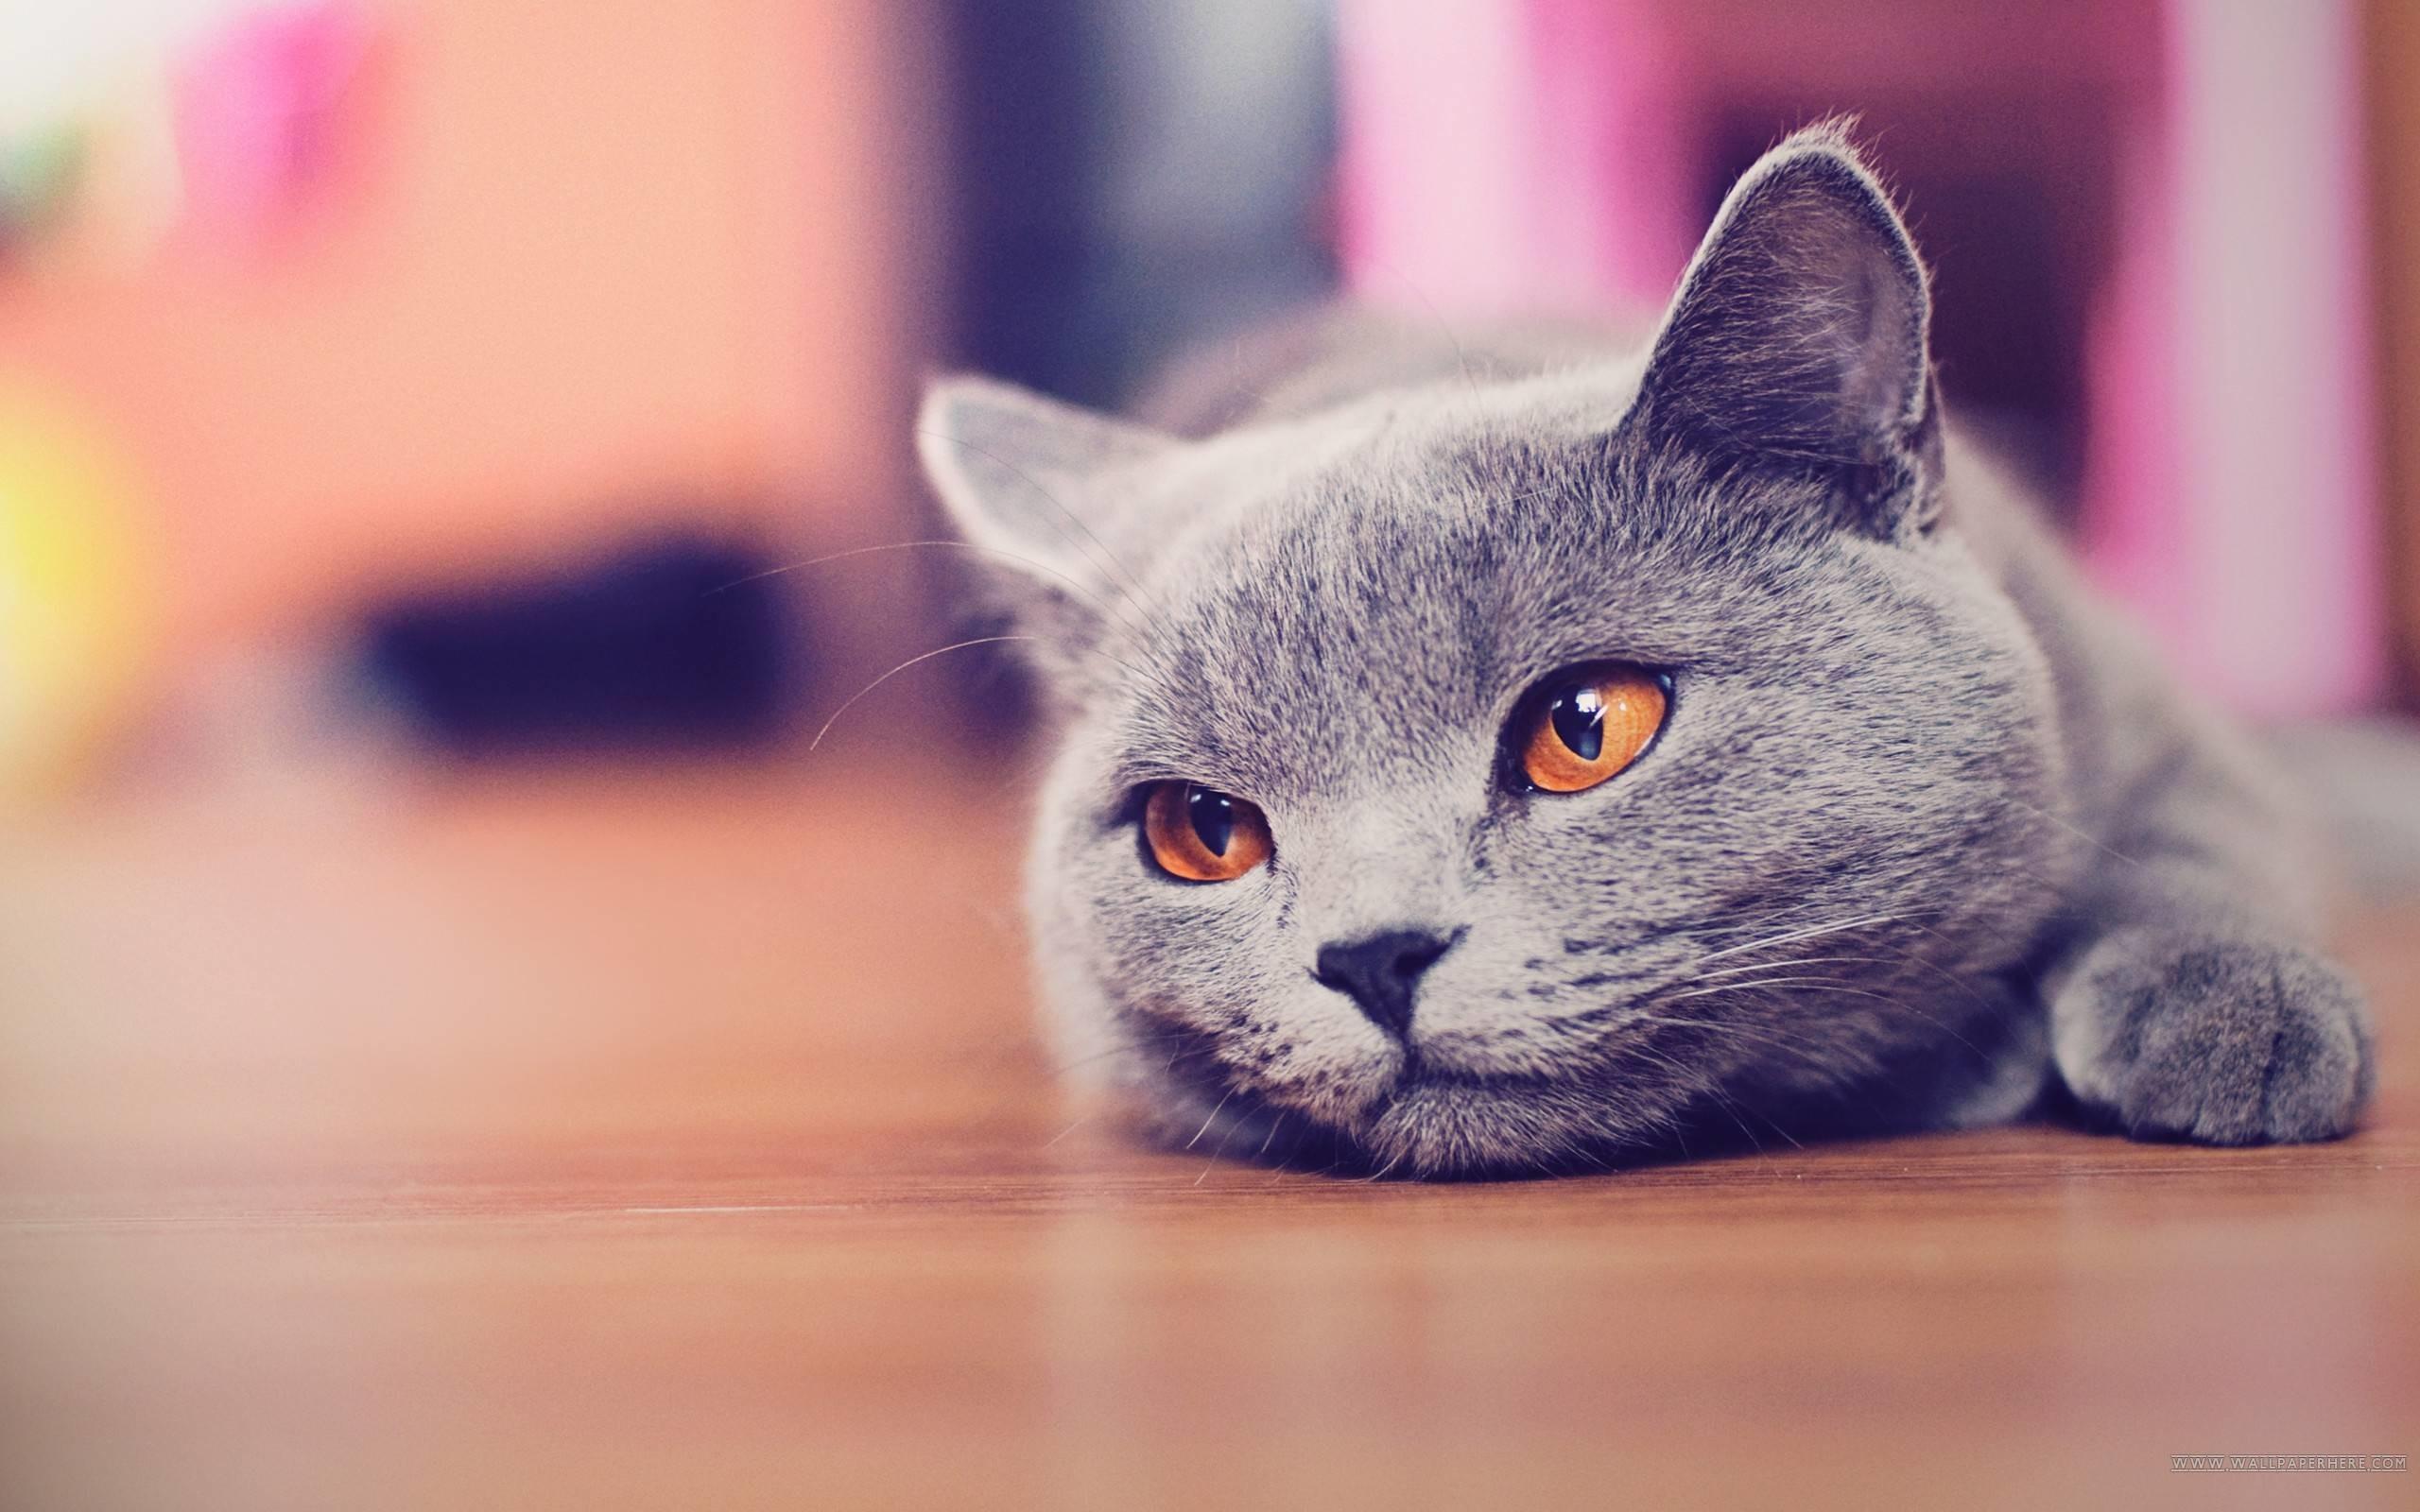 Cute Cat Desktop Wallpaper – Animals, Cute Wallpapers